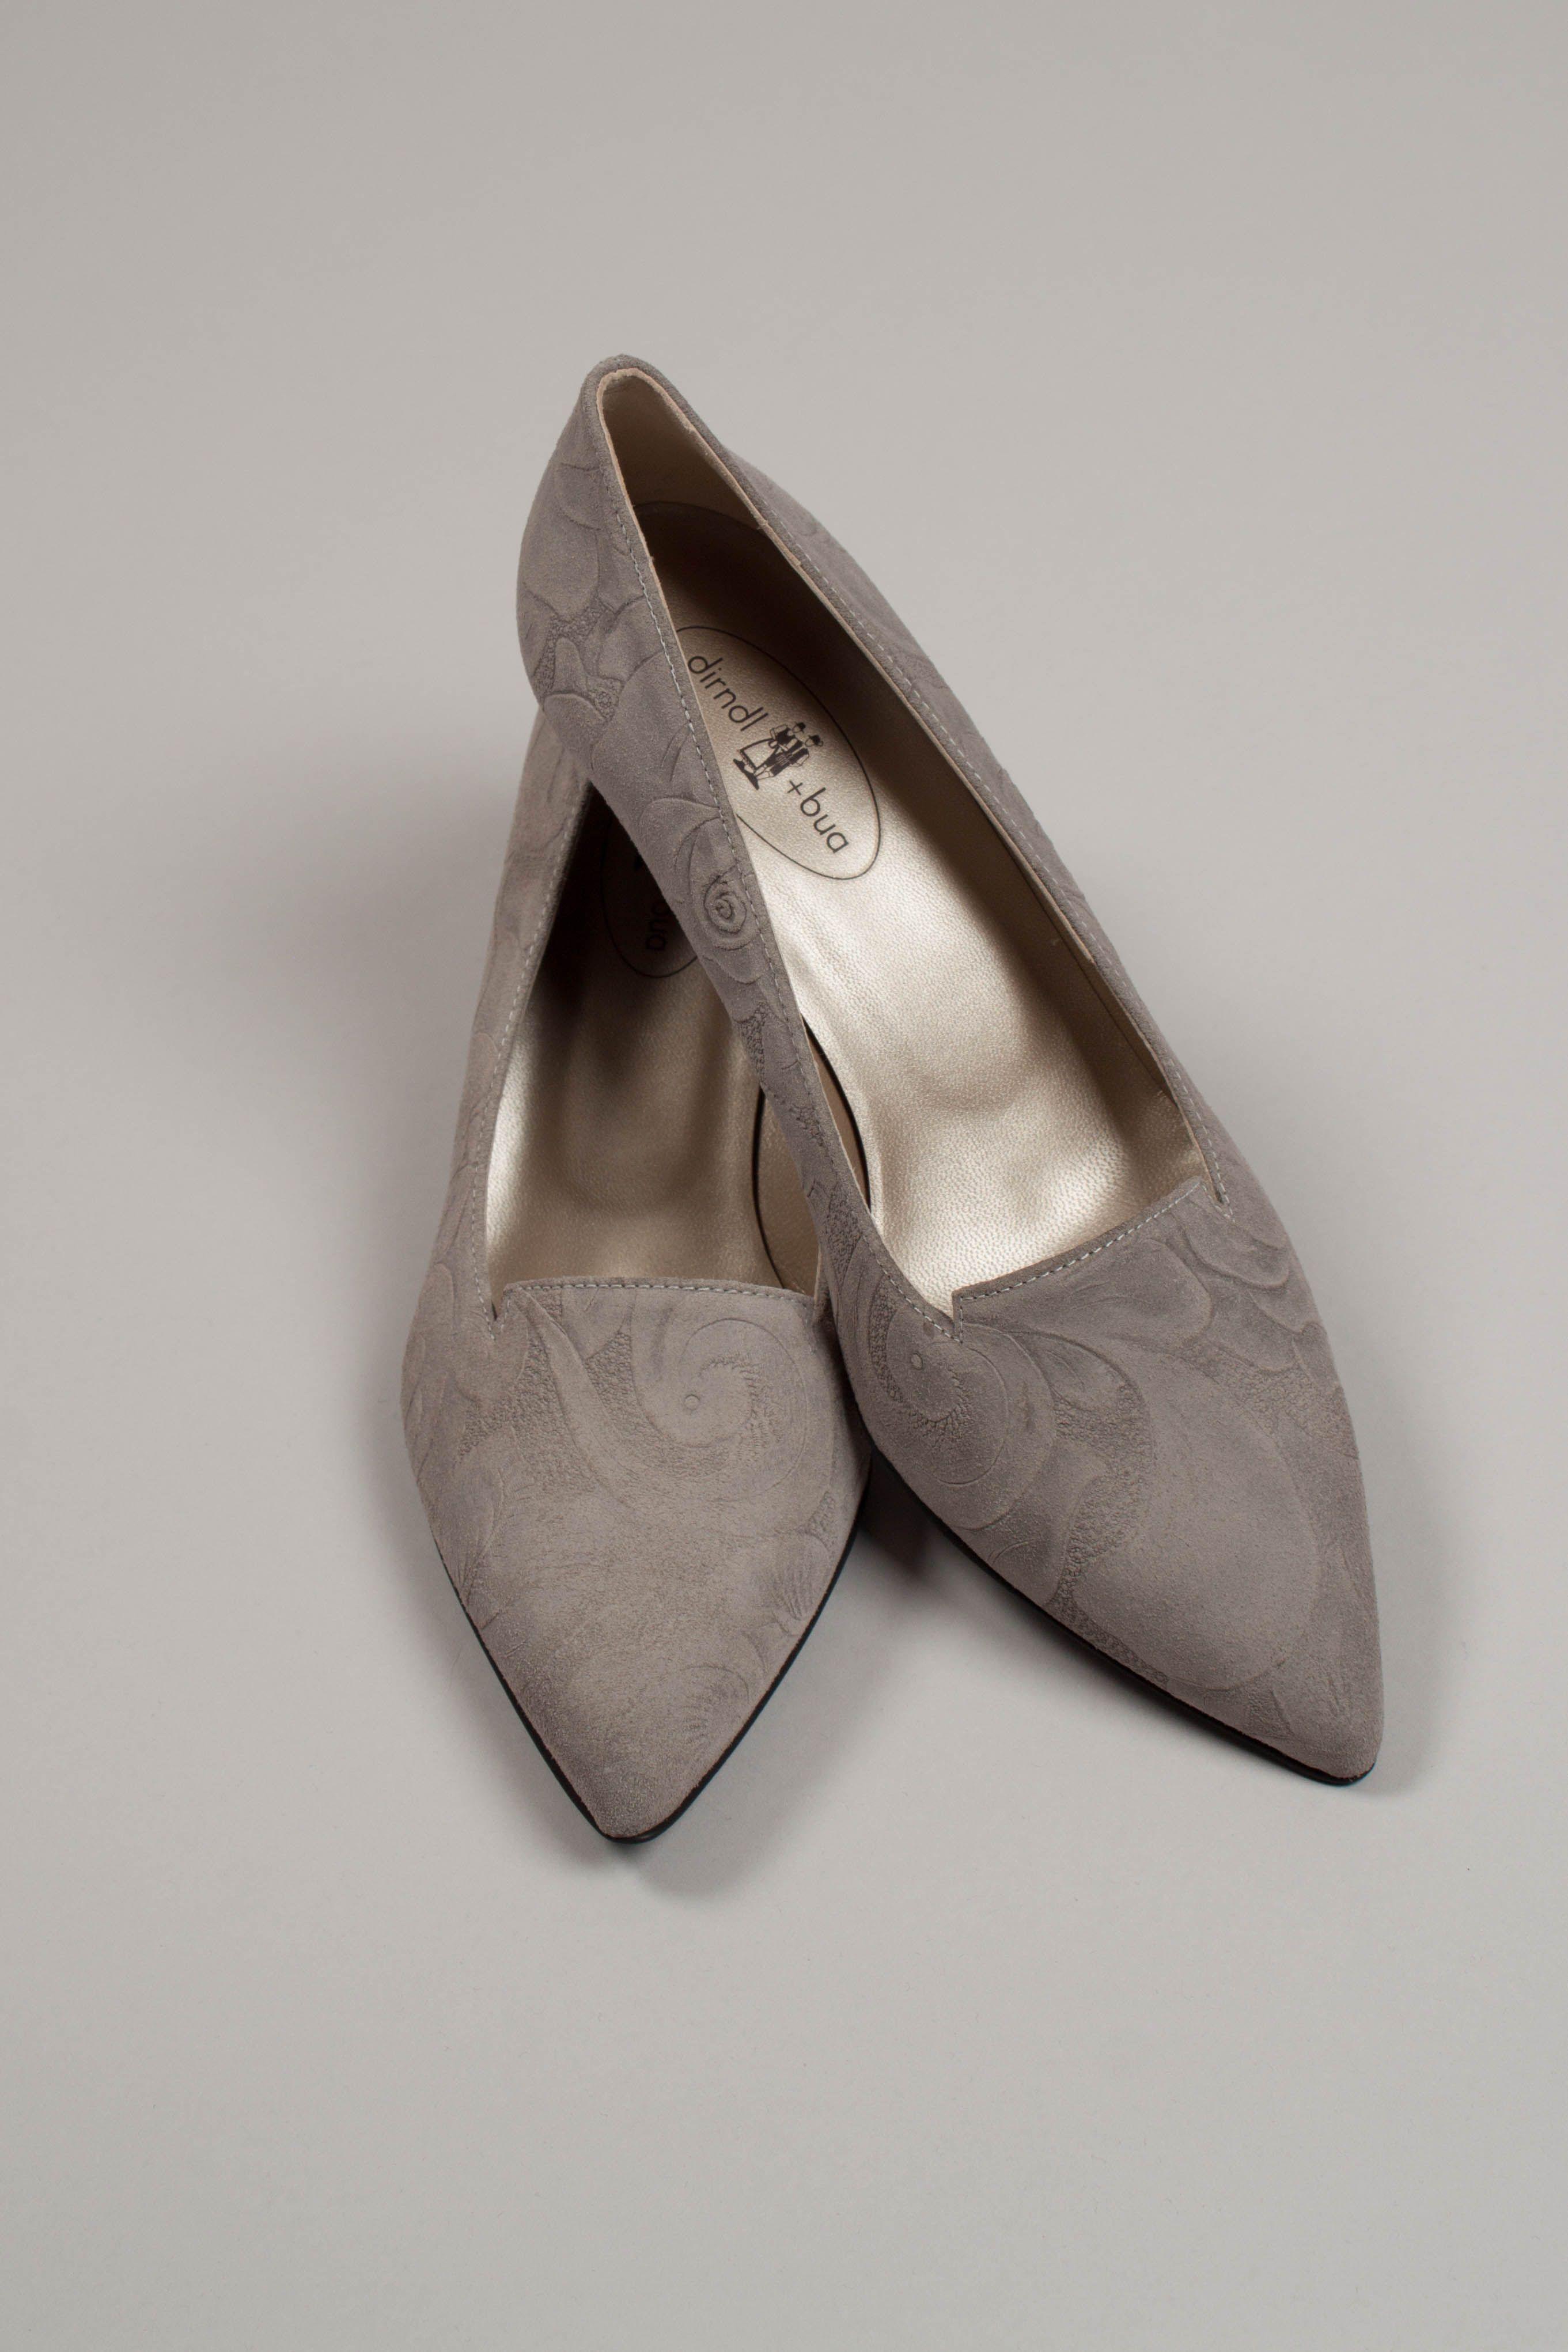 los angeles fe758 09e77 Tolle Schuhe von Dirndl + Bua. | Shoes | Dirndl schuhe ...